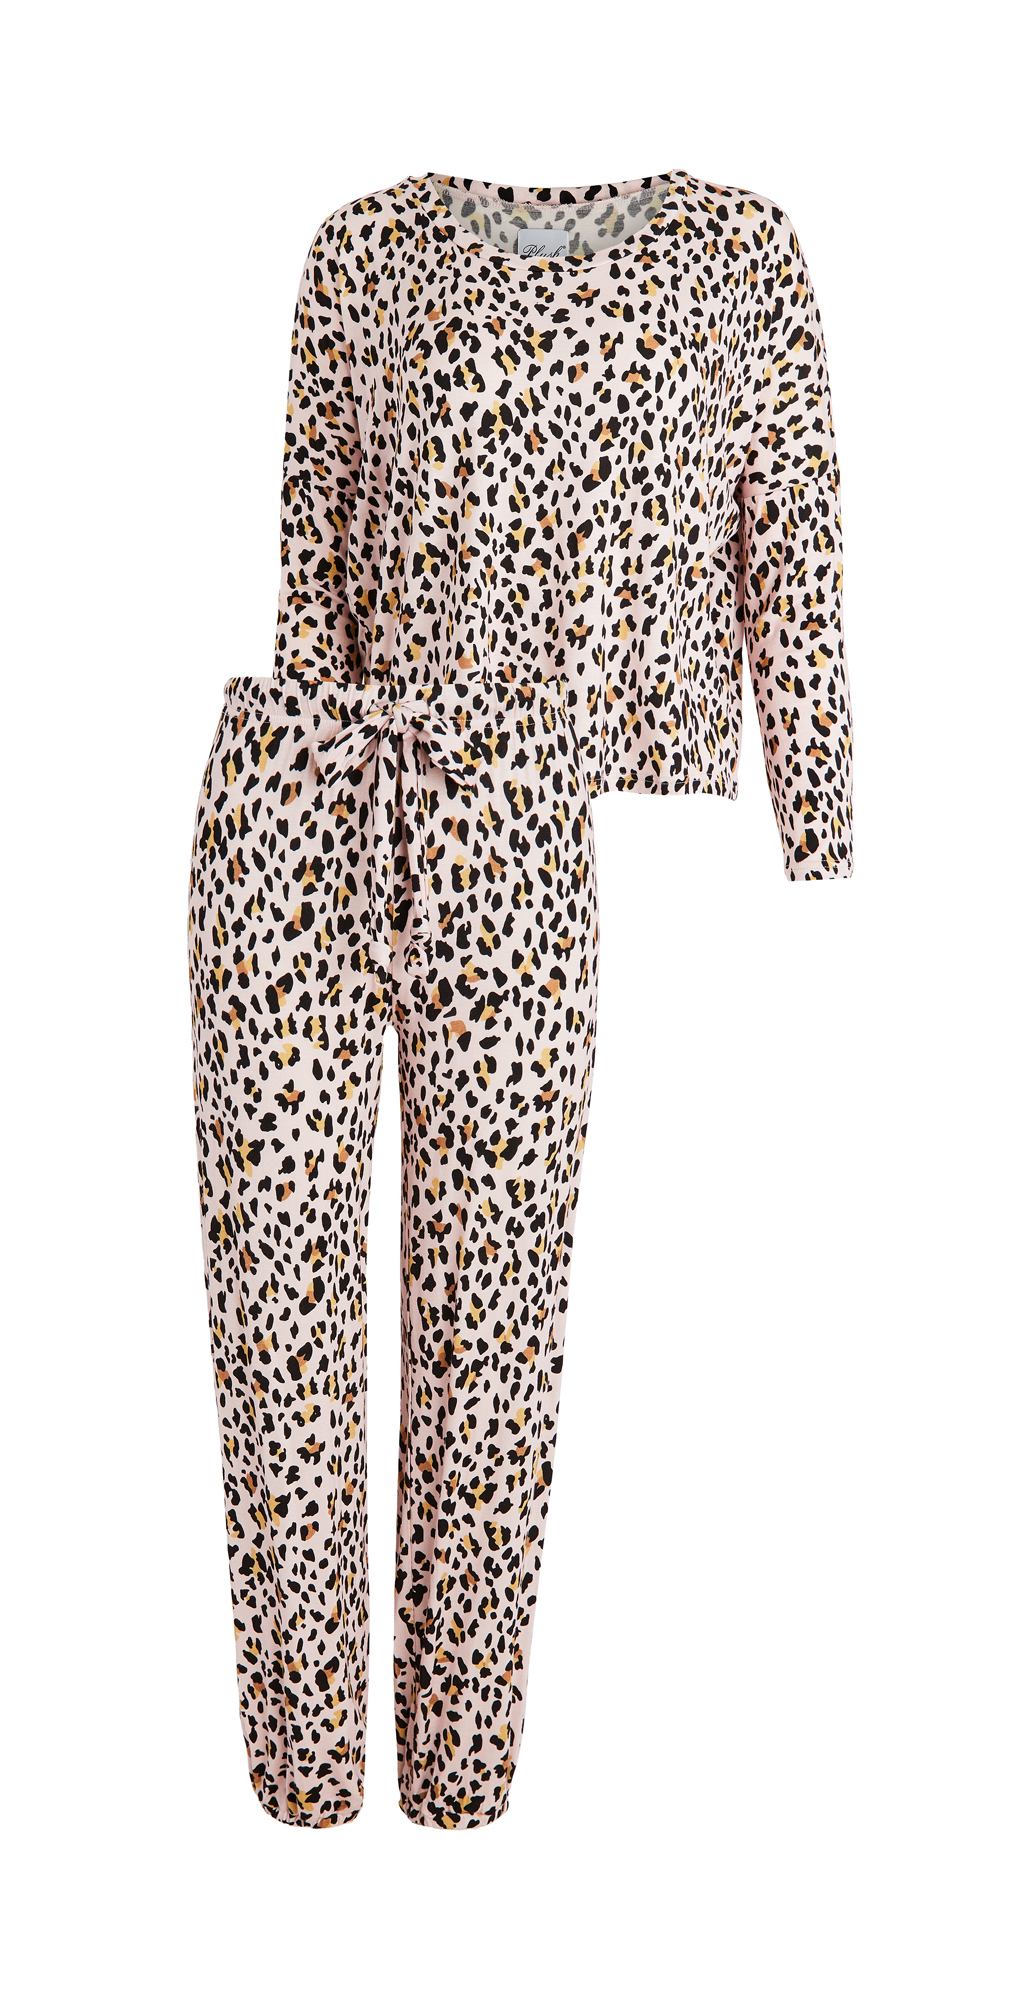 Plush Ultra Soft Cheetah Jersey PJ Set + Scrunchie